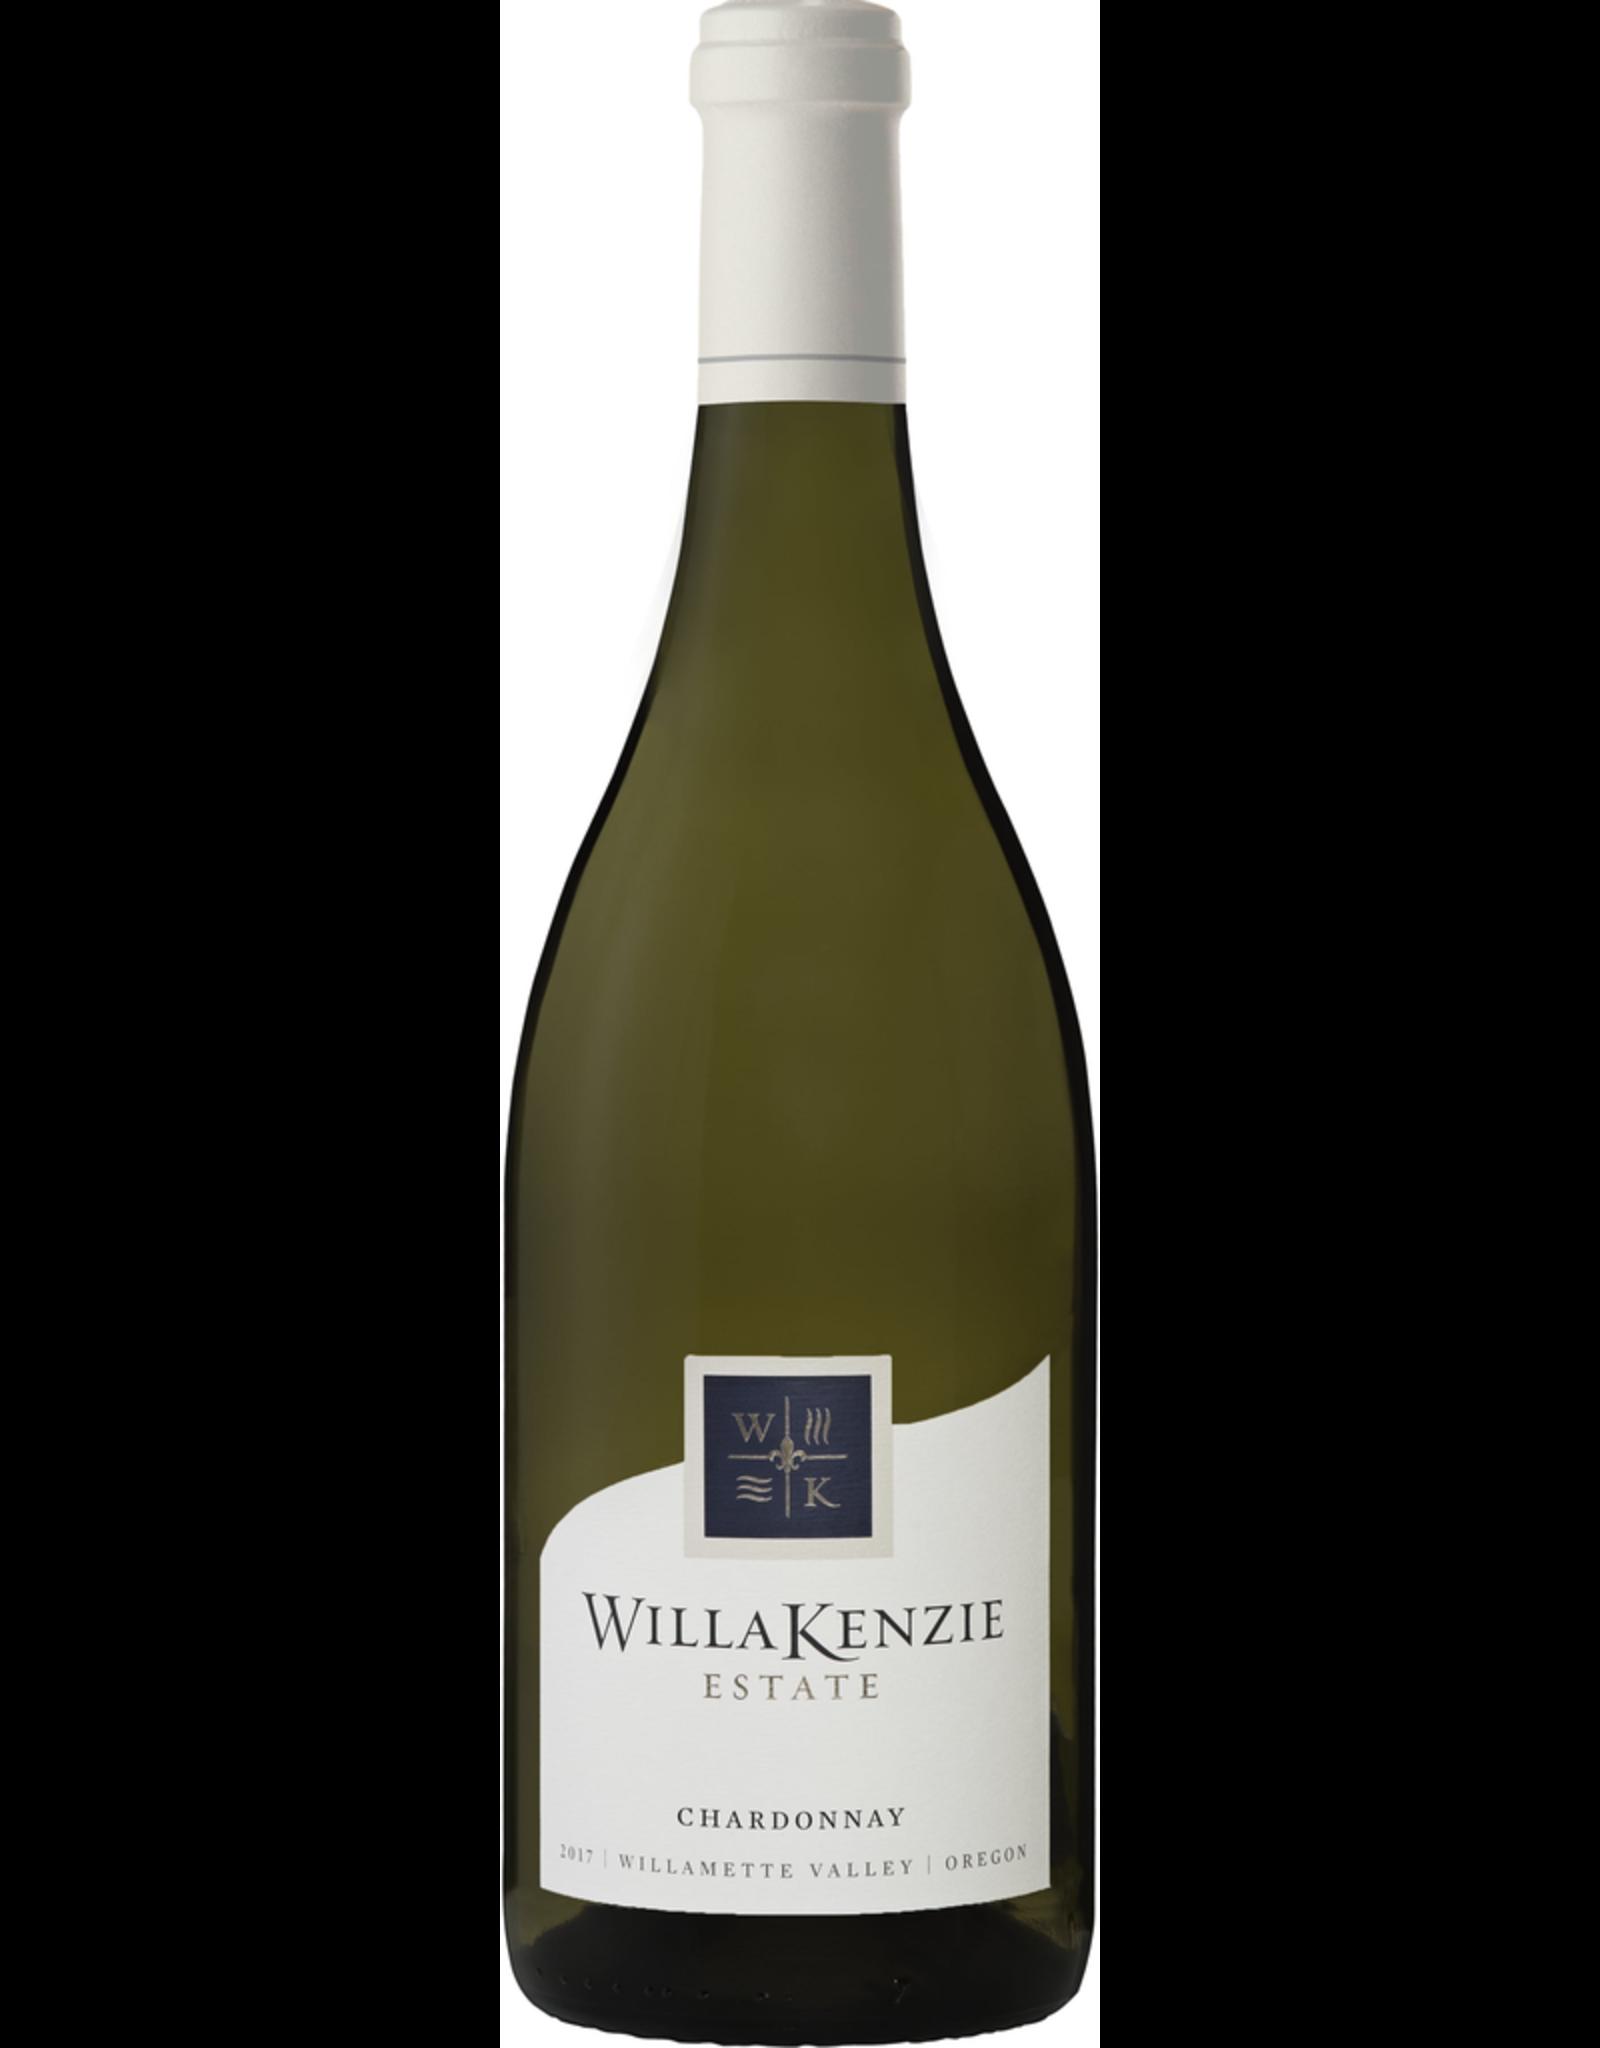 White Wine 2017, WillaKenzie, Chardonnay, Multi AVA, Willamette Valley, Oregon, 13.6% Alc, CT 90.3